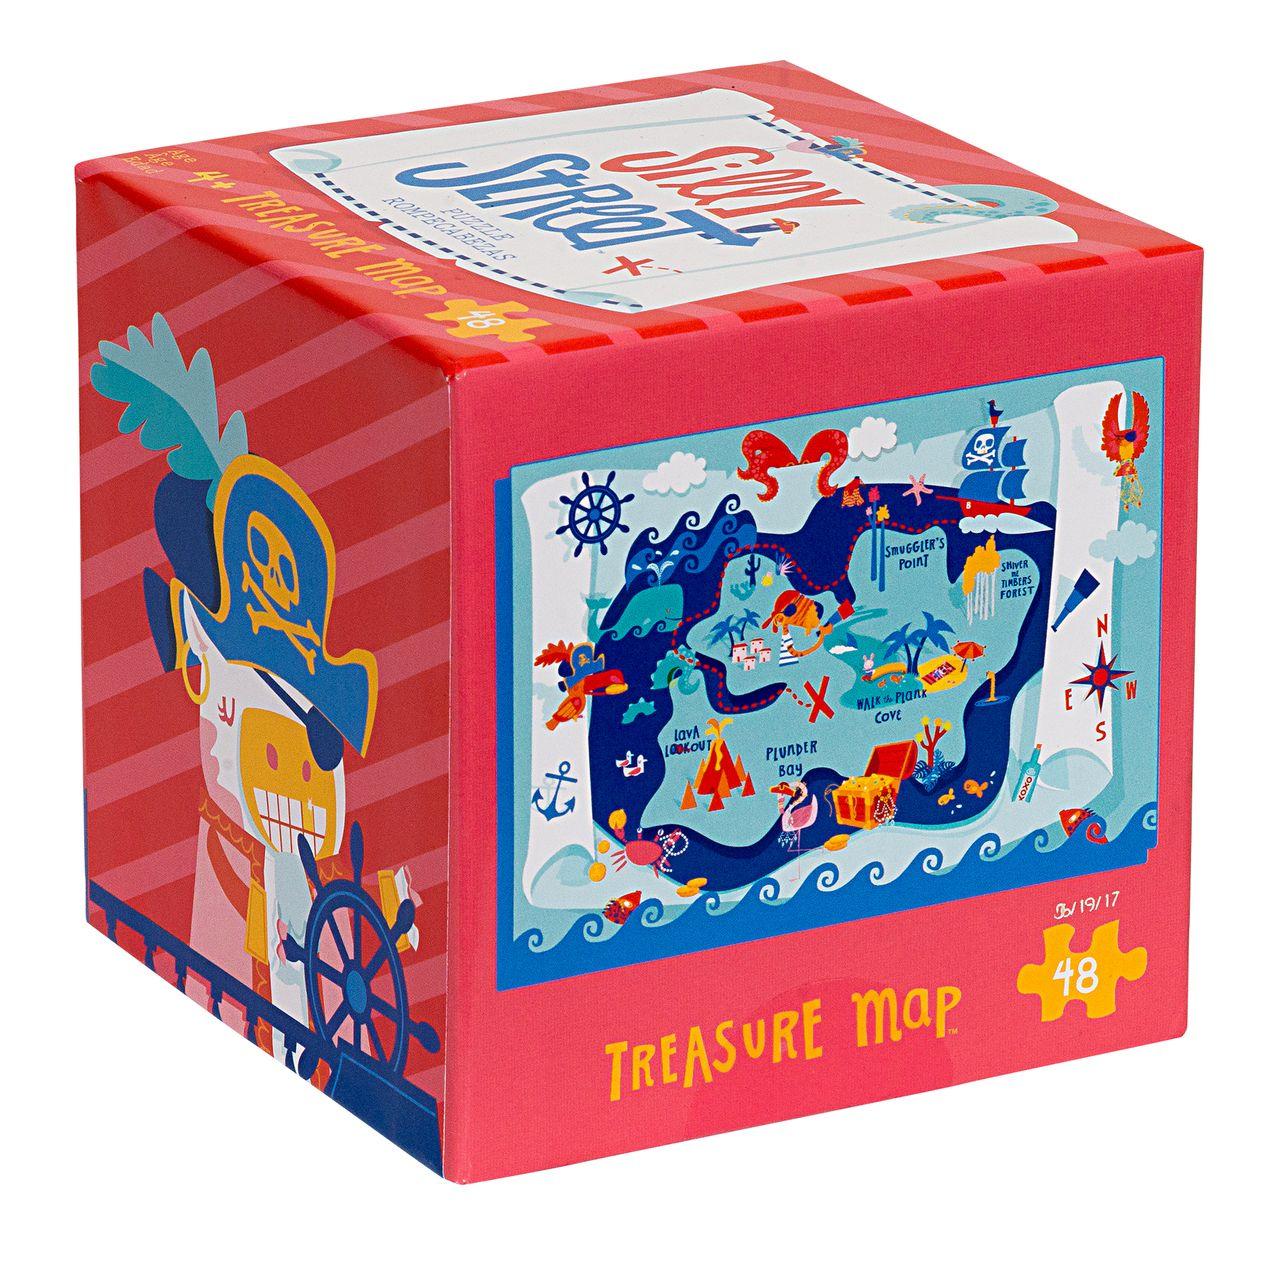 Silly Street Treasure Map 48 Piece Children's Jigsaw